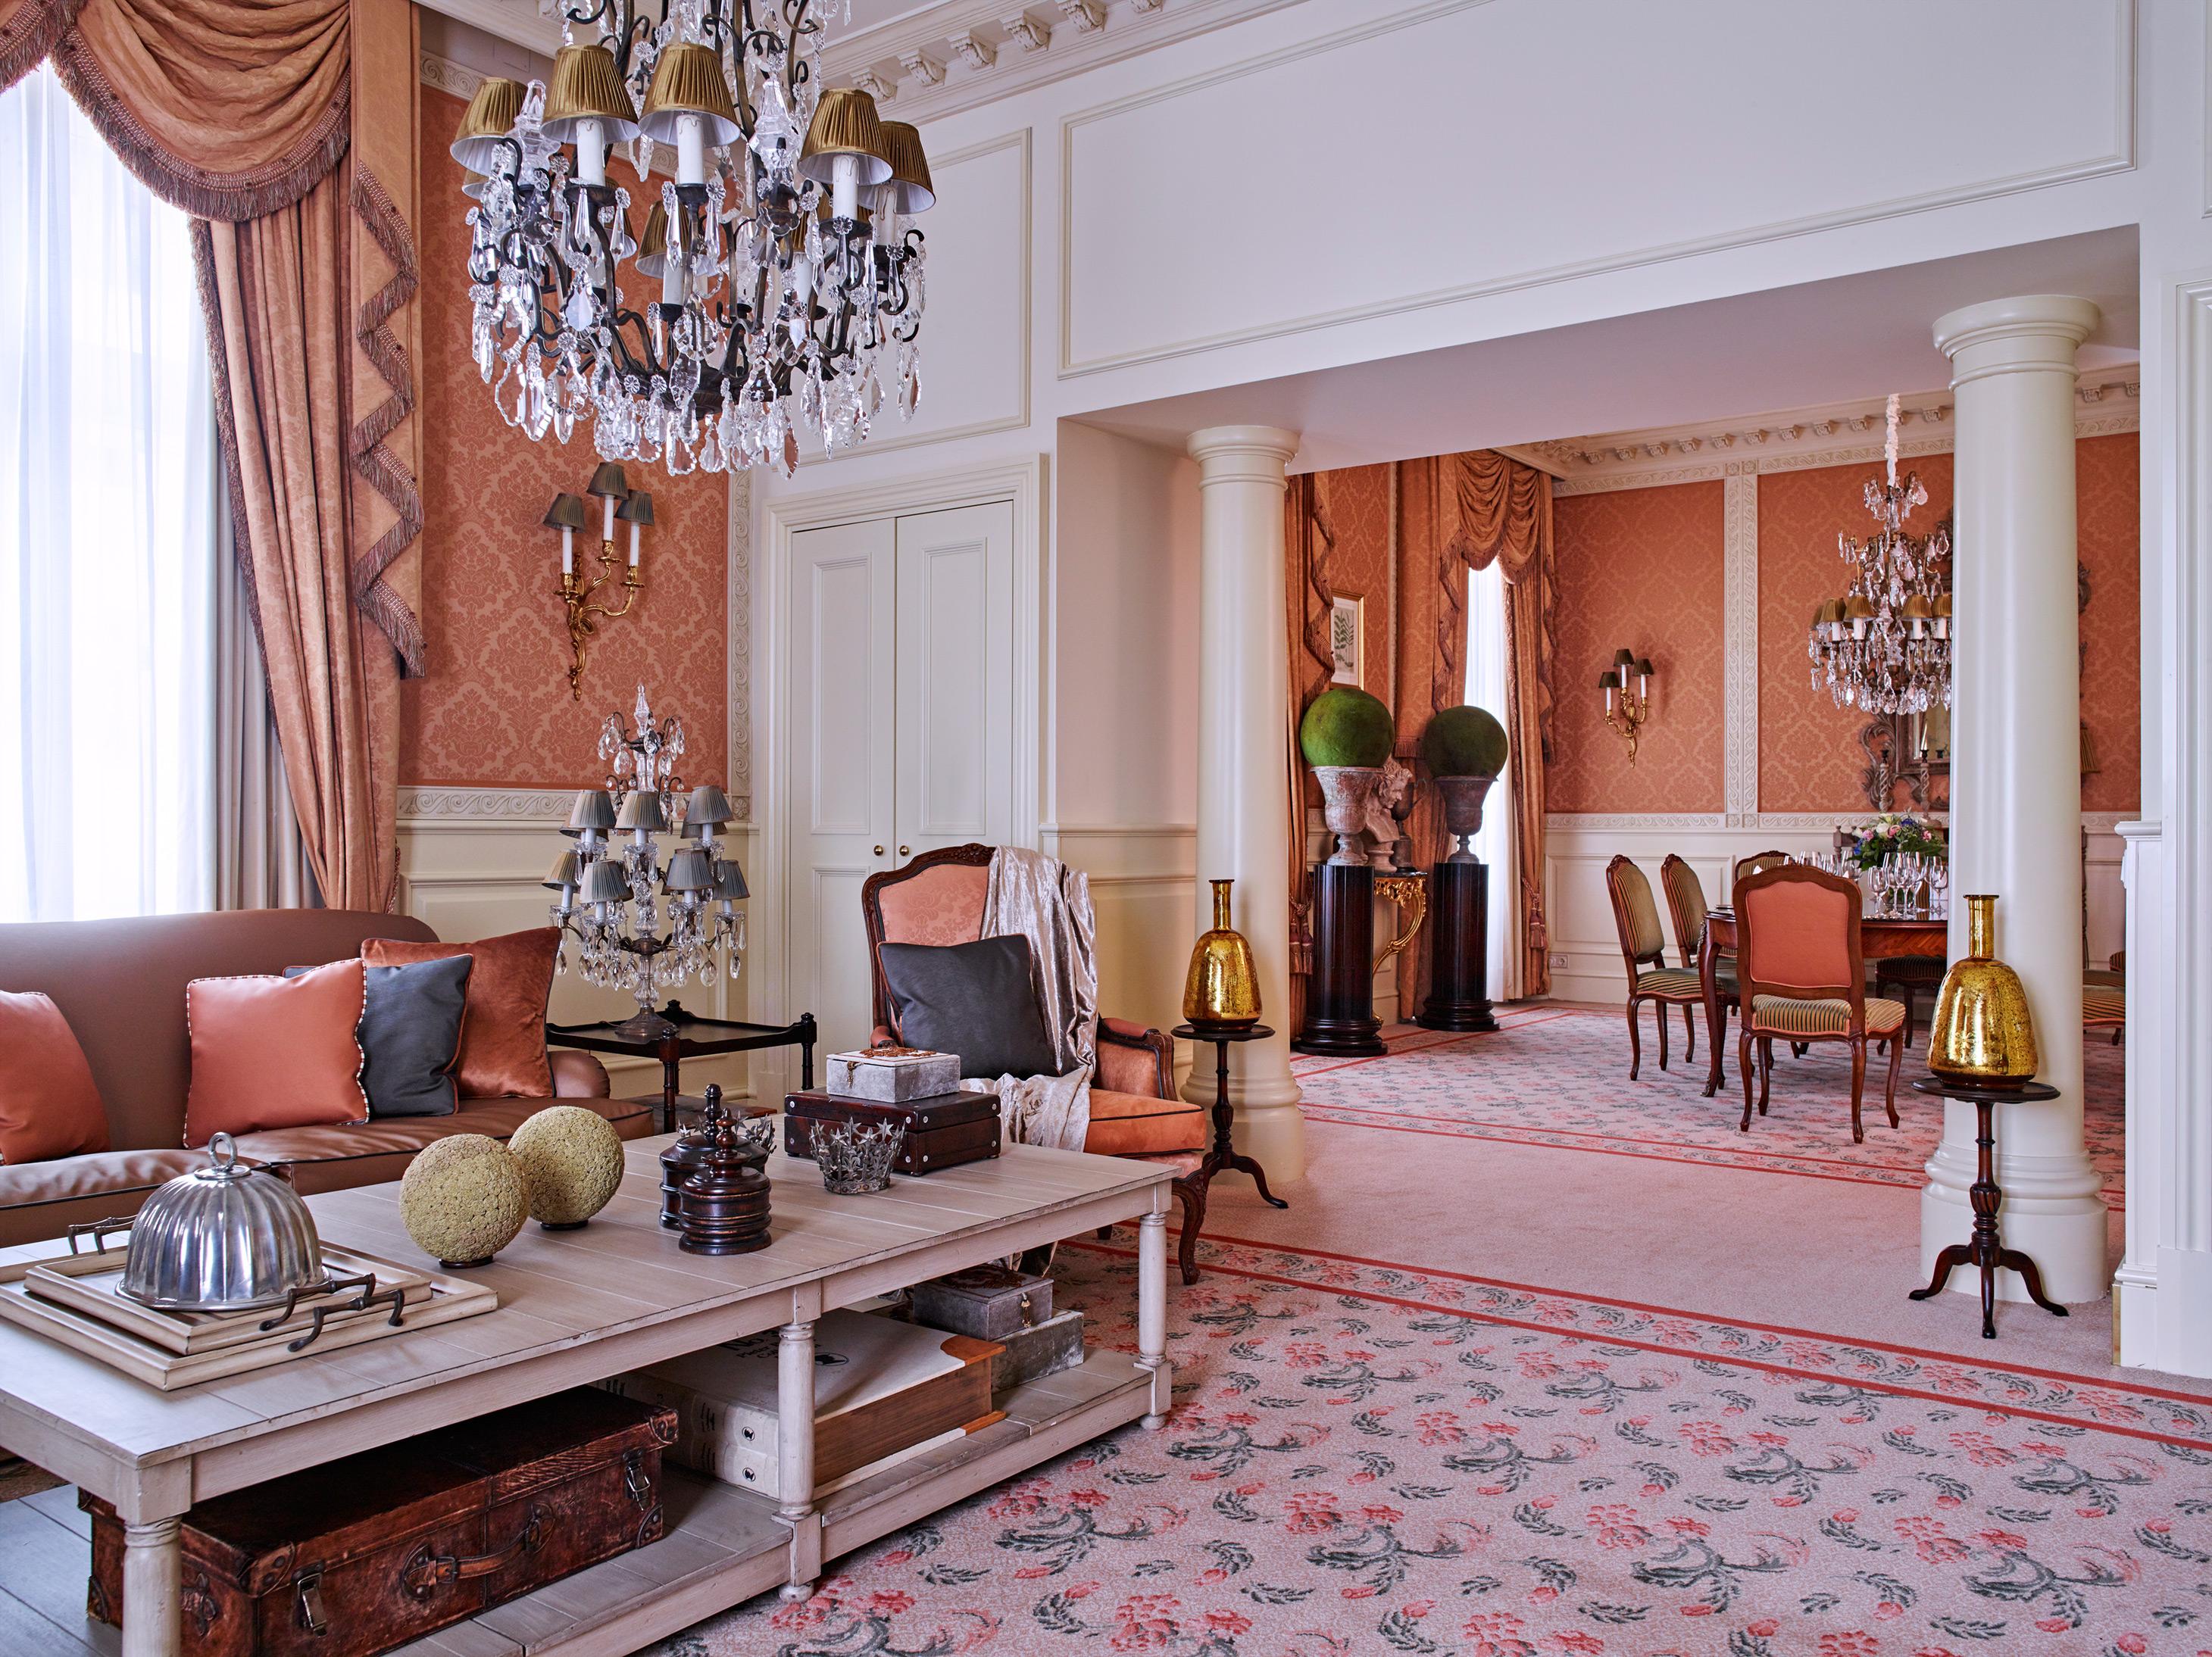 Grand_Hotel_Wien_Vienna_Austria_Suite_Hotel_Venice_Magazine